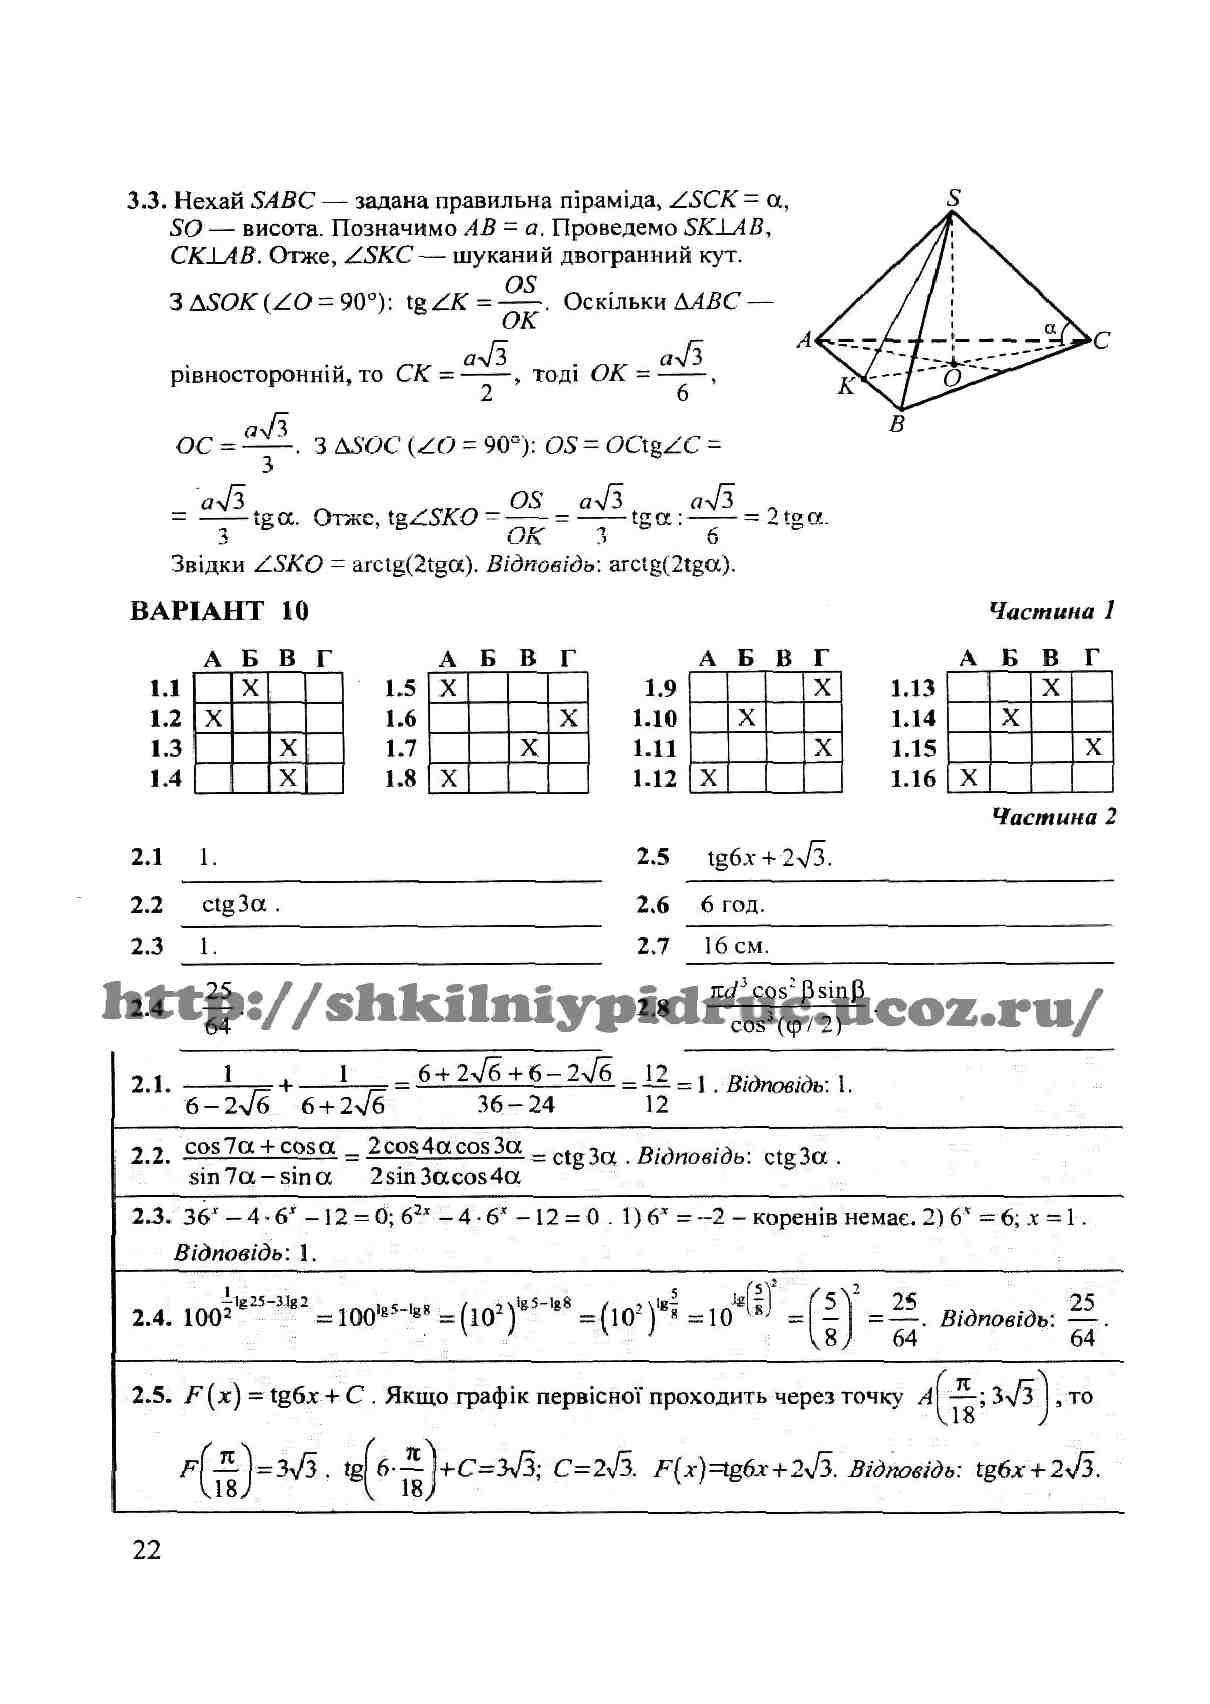 решебник дпа с математики 11 клас